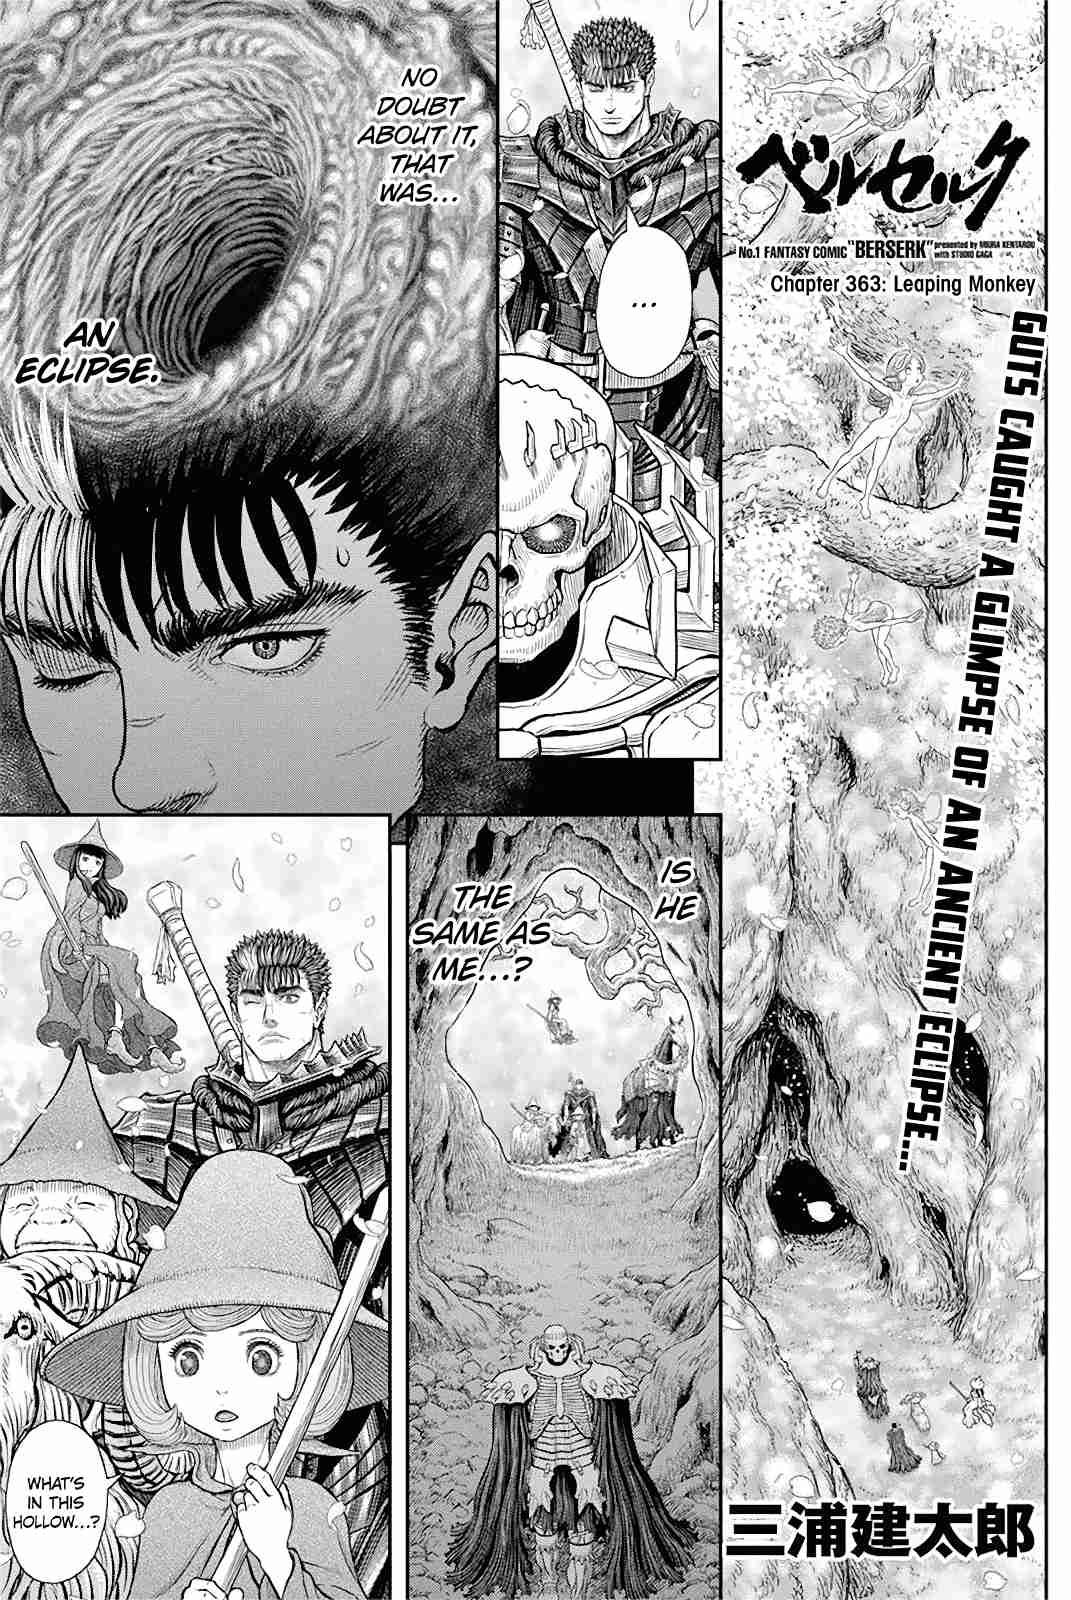 https://manga.mangadogs.com/comics/pic4/35/163/2789576/862a8af927652b7b2fbf7128cf6b360f.jpg Page 1